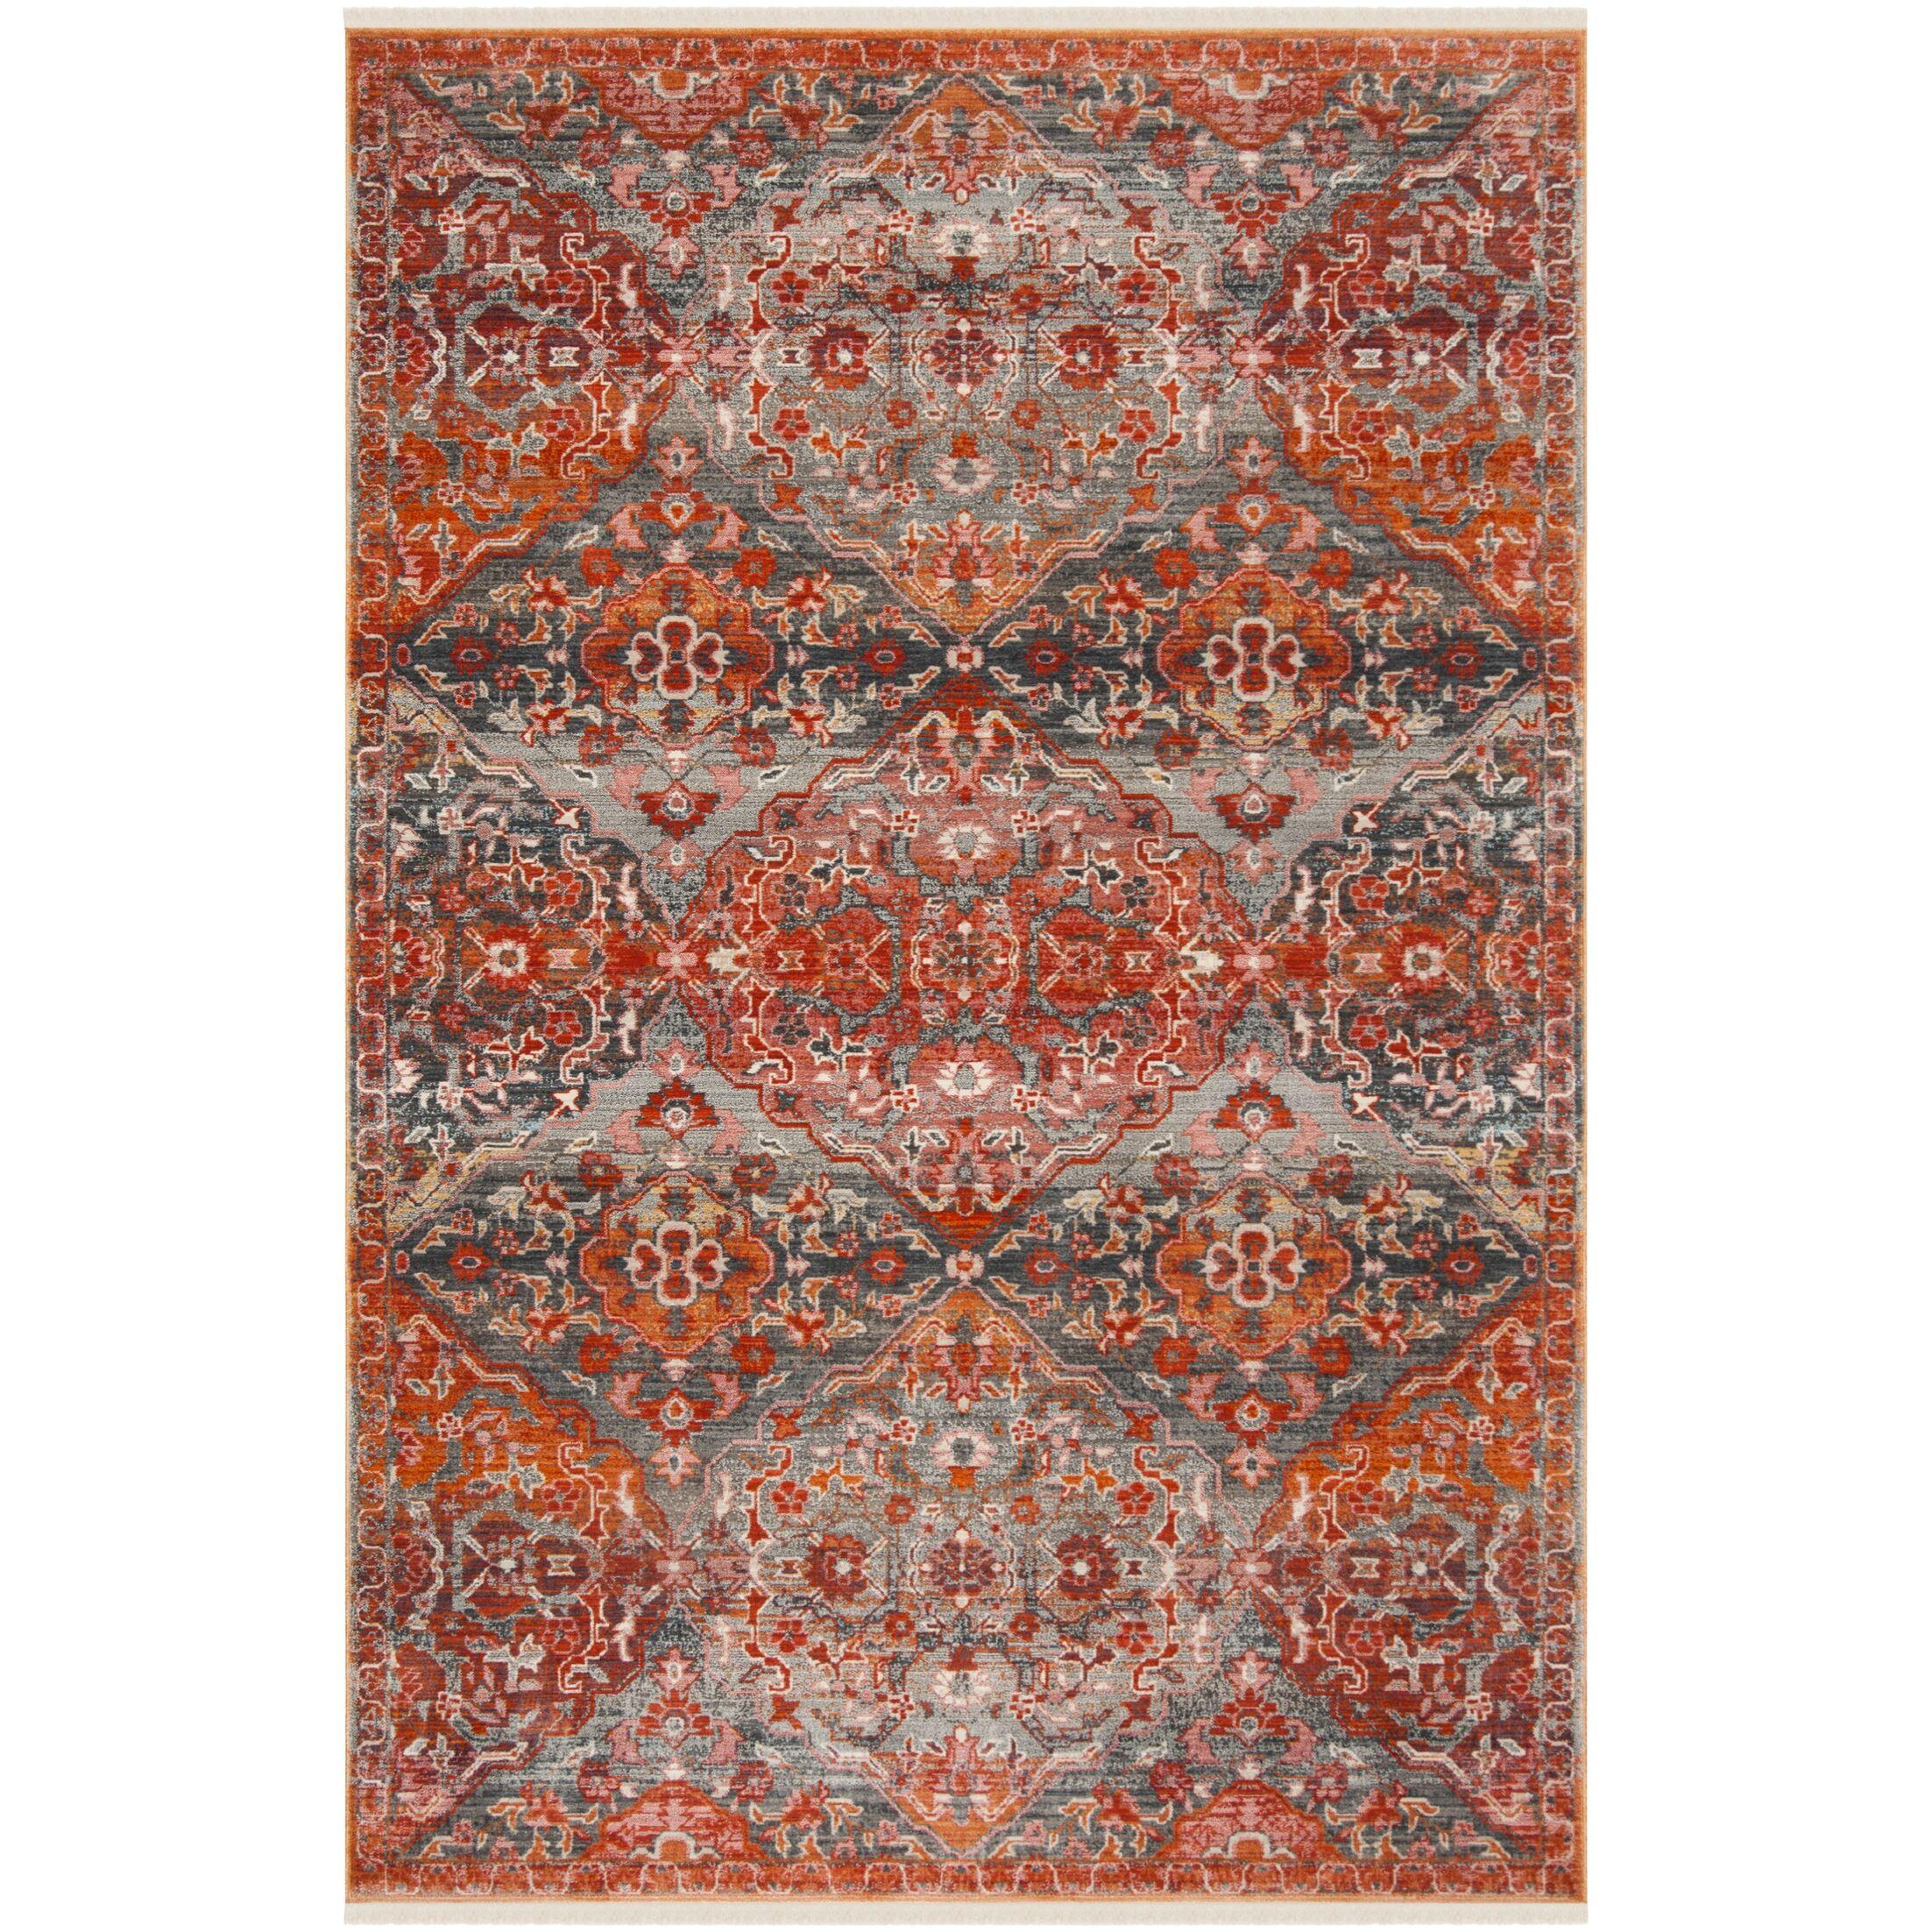 Feldmann Vintage Persian Orange Area Rug Rug Size: Rectangle 4' x 6'